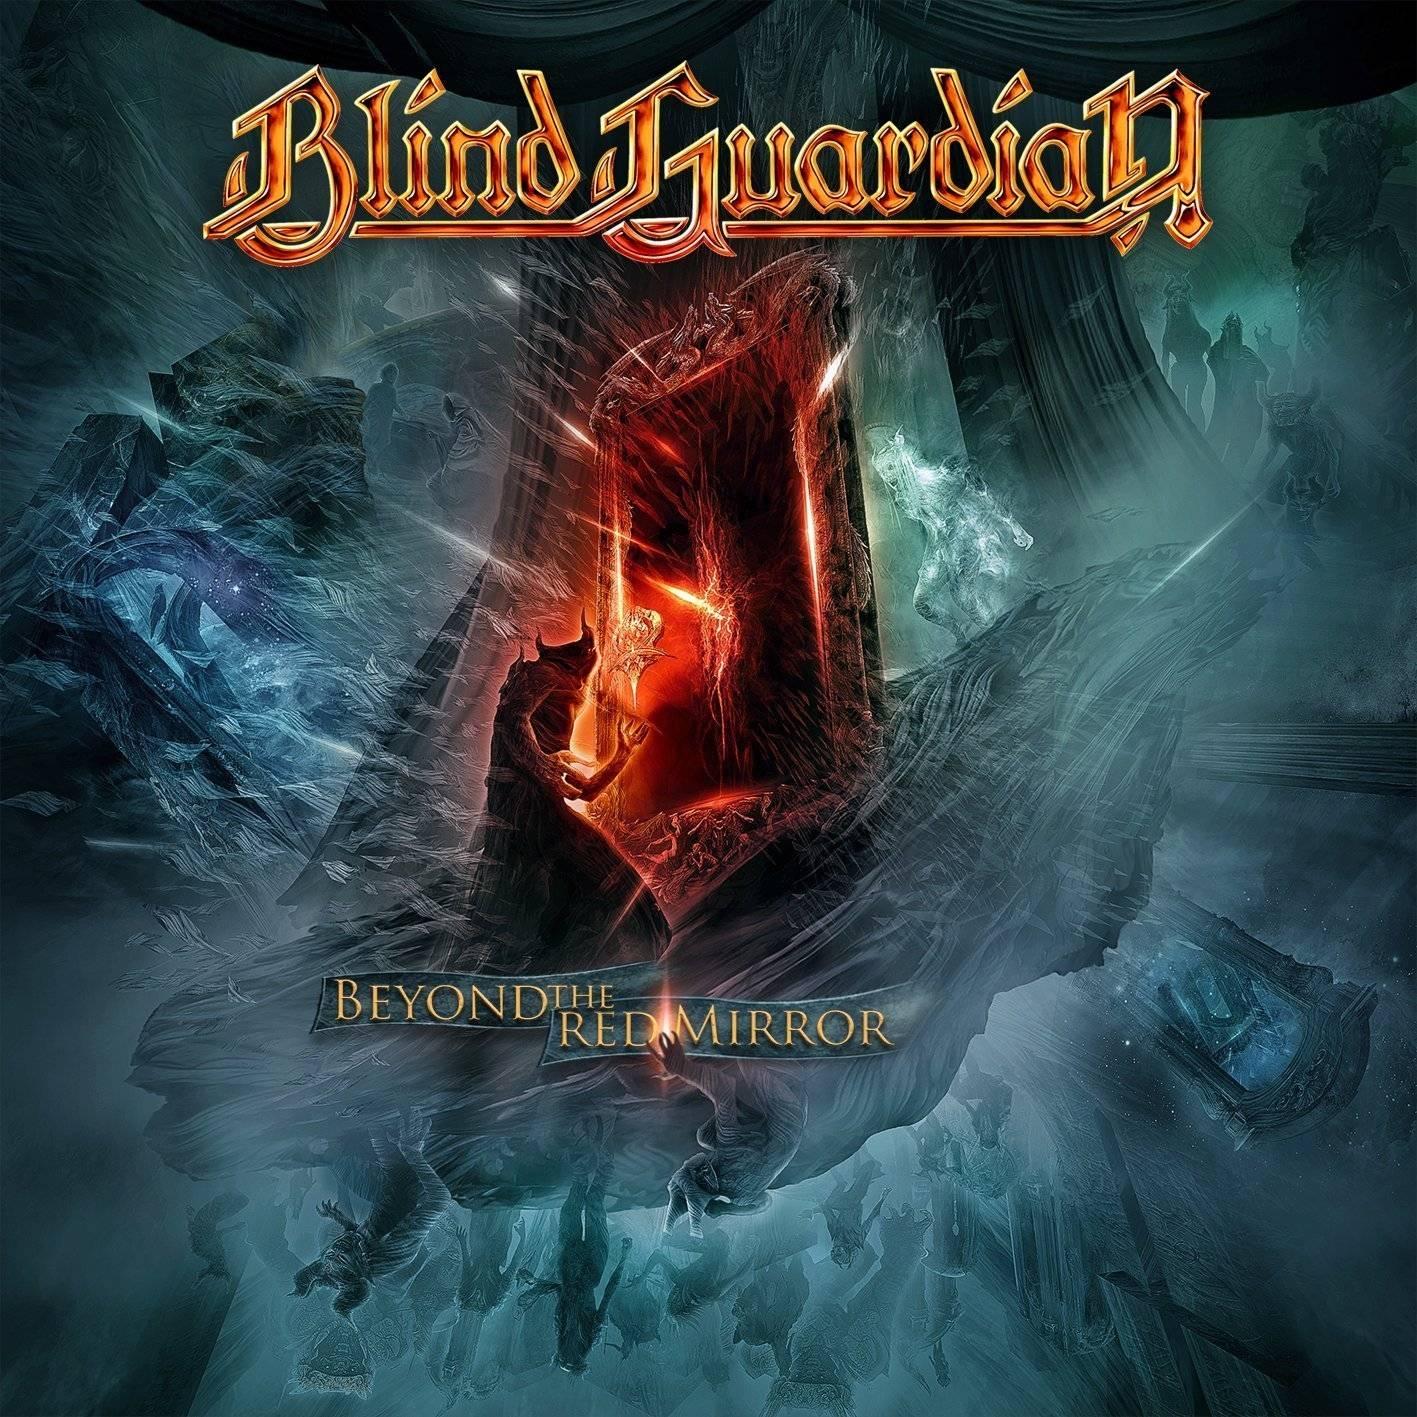 Blind Guardian - Beyond The Red Mirror (2015/2018) [Official Digital Download 24-bit/96kHz]